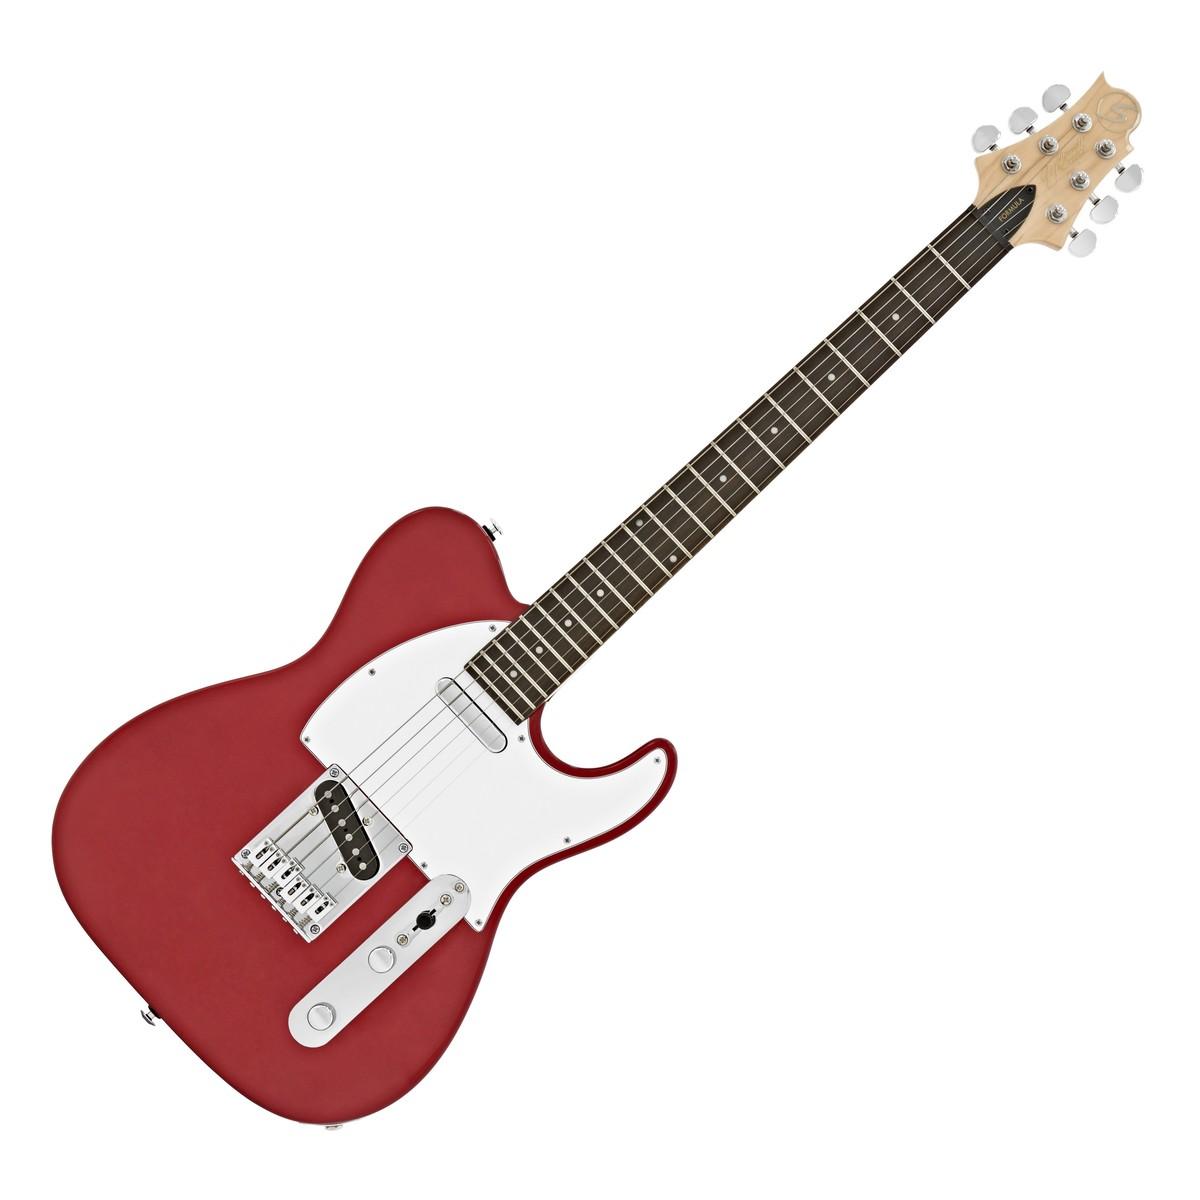 greg bennett formula fa 1 electric guitar midnight red at. Black Bedroom Furniture Sets. Home Design Ideas